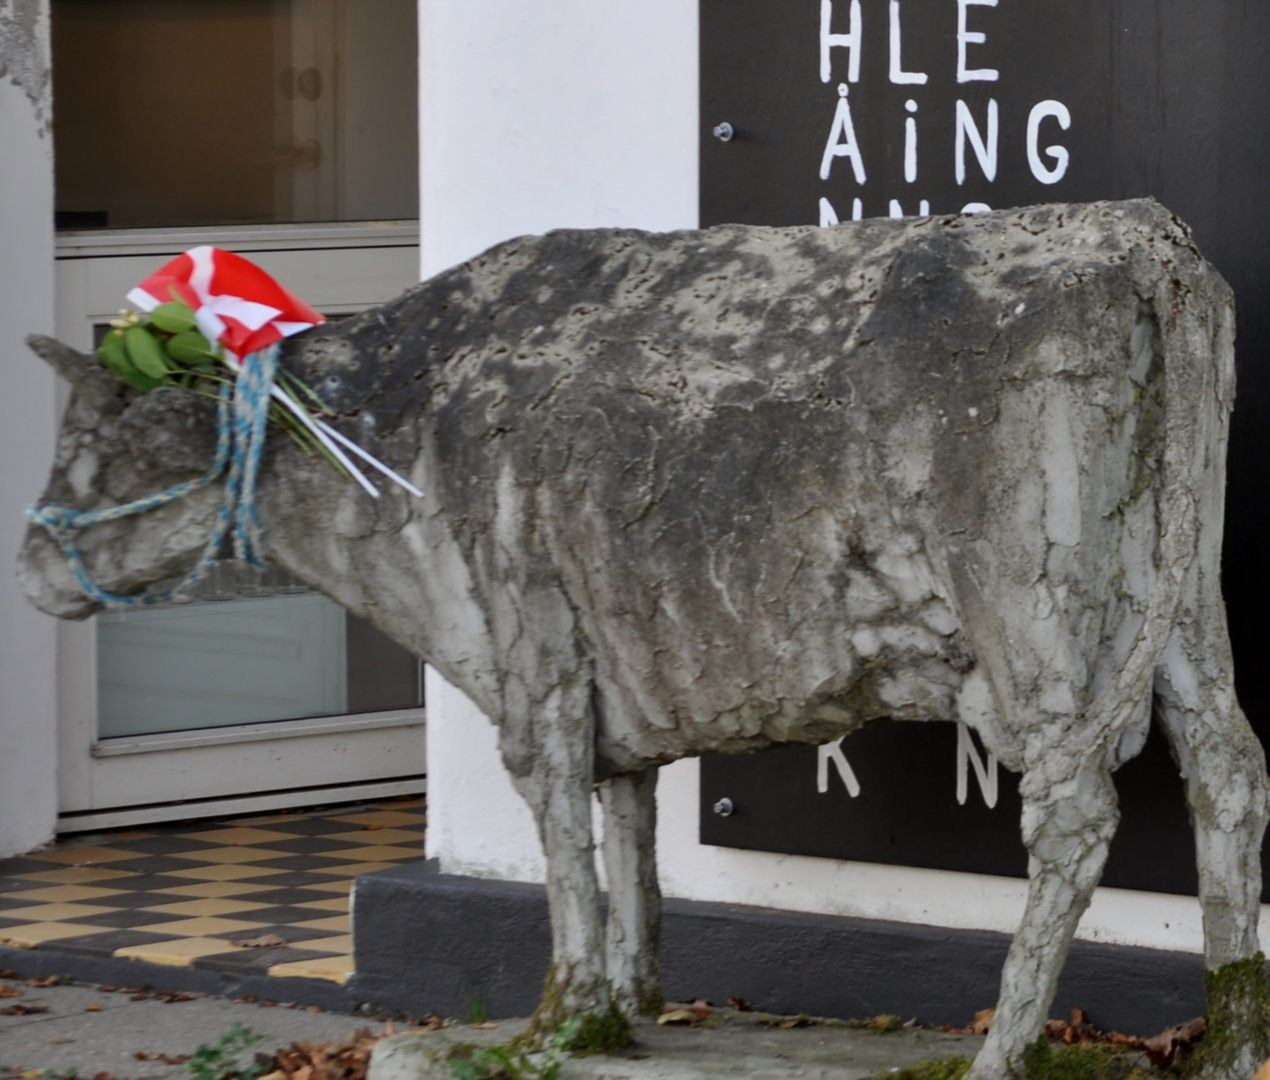 Kunst an der Kuh